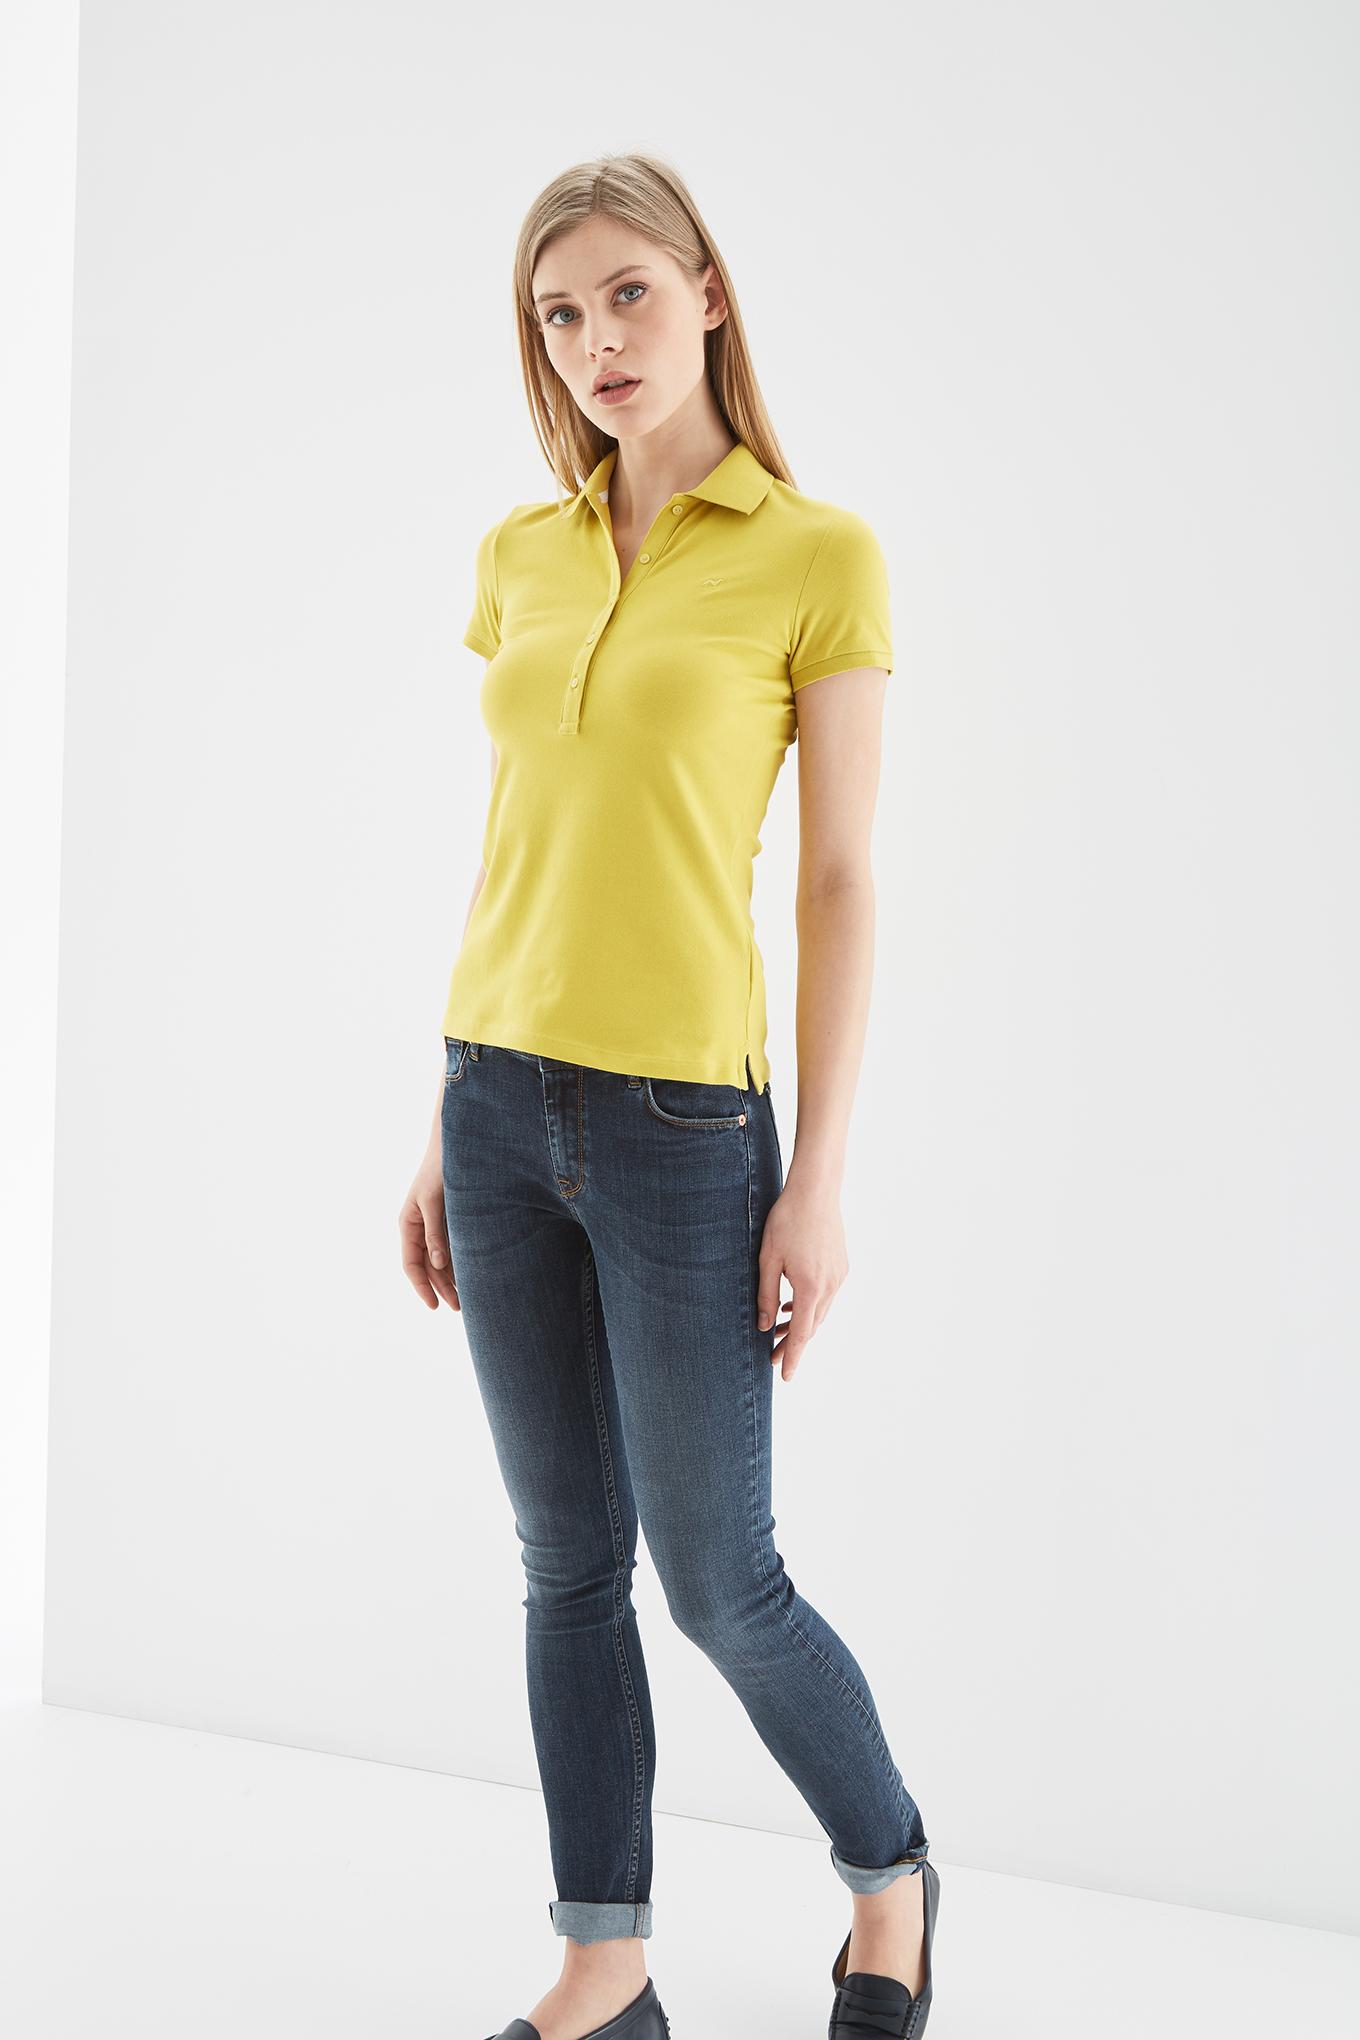 Polo Piquet Yellow Sport Woman